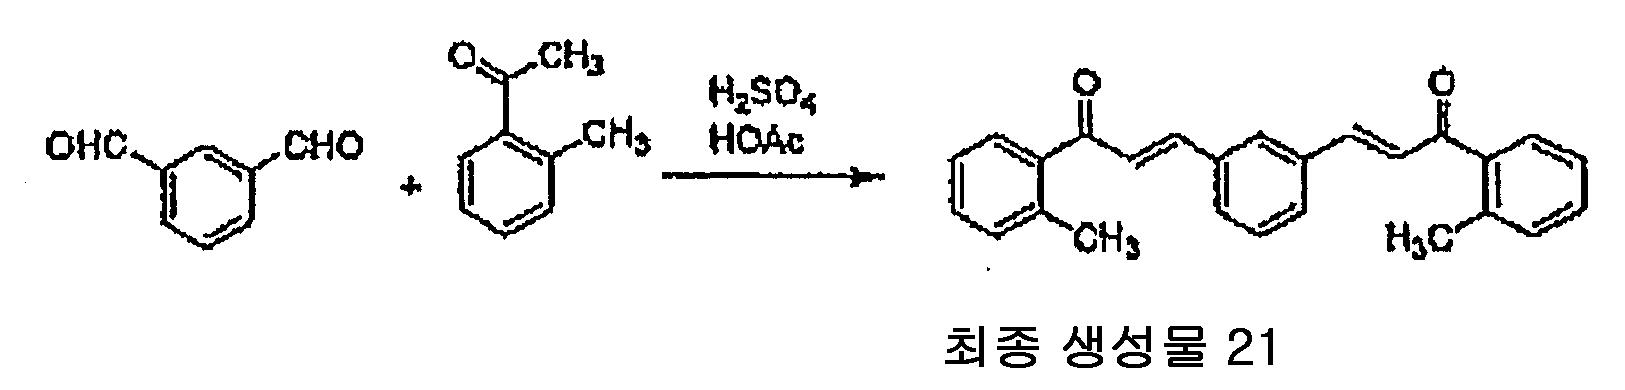 Figure 112010002231902-pat00116